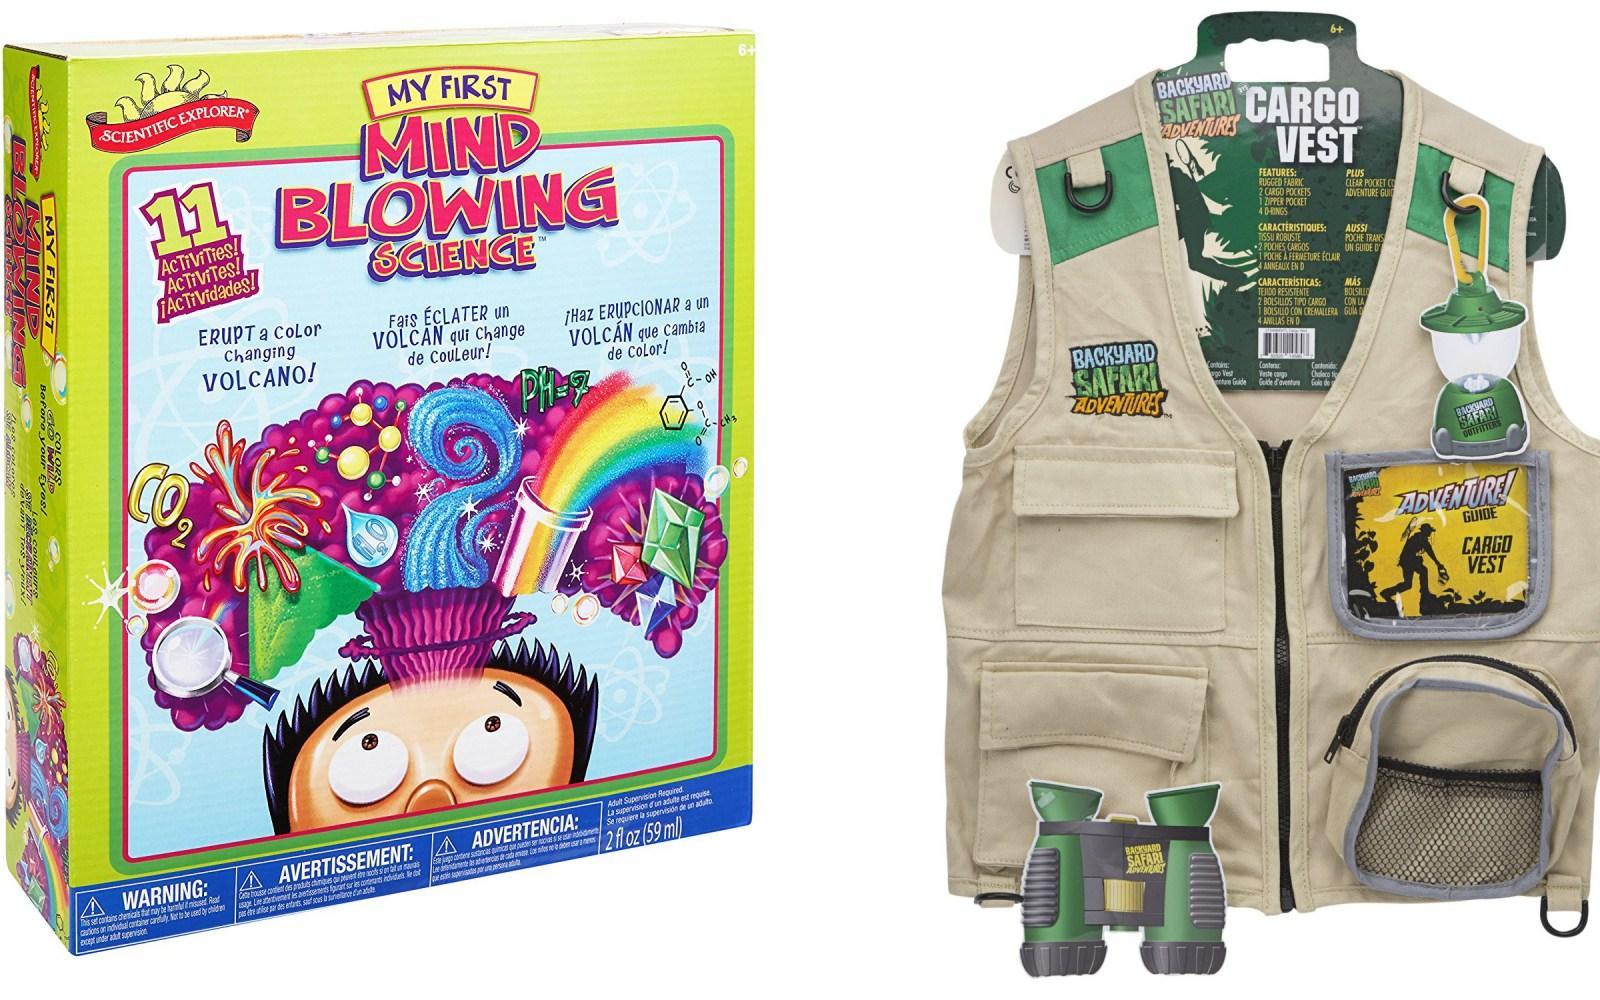 Backyard Safari Toys amazon's 1-day alex toys sale up to 50% off: backyard safari cargo